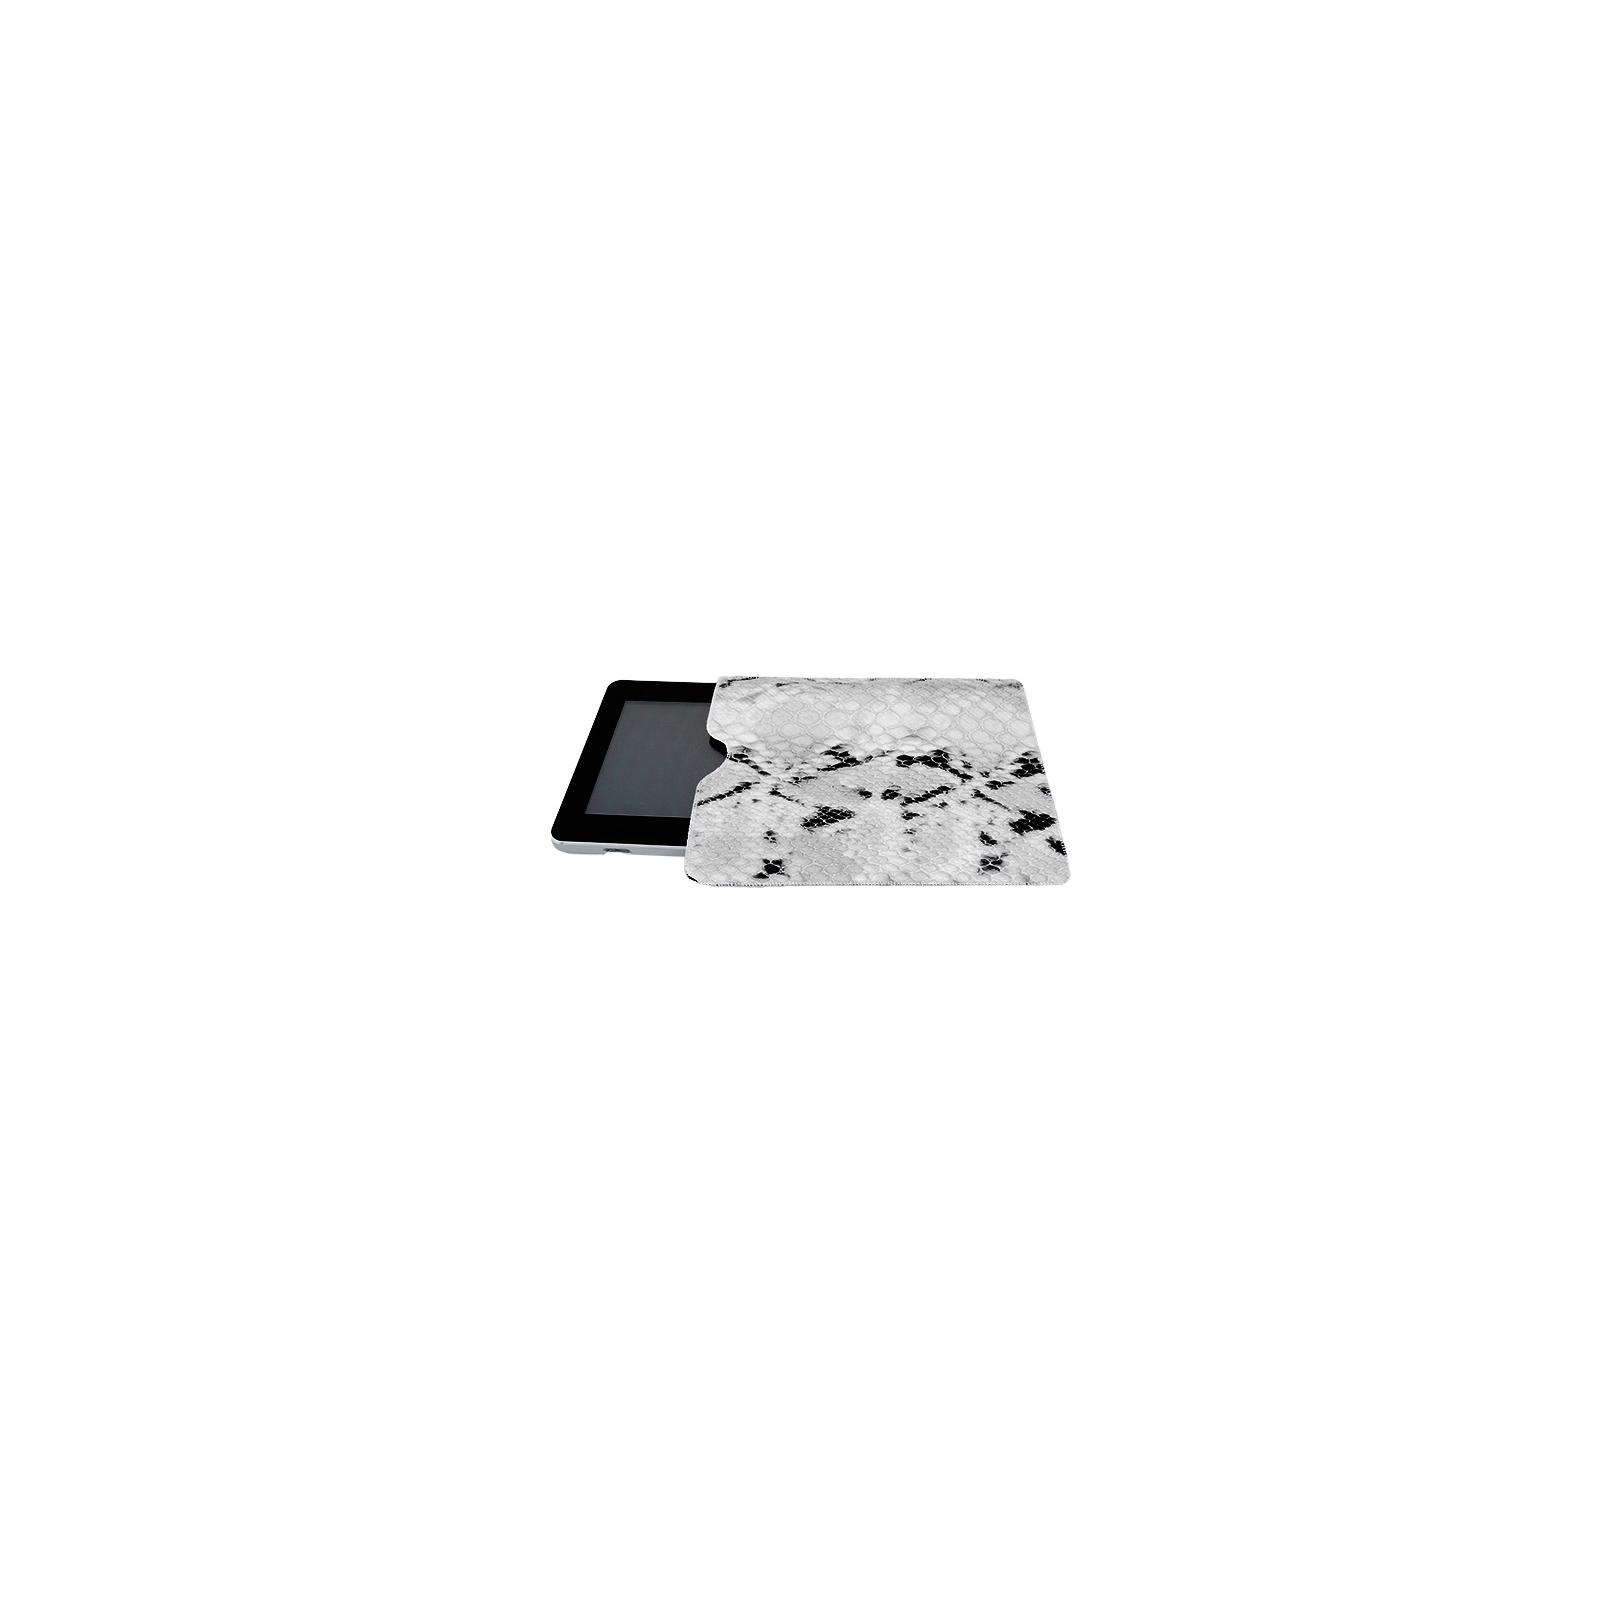 "Чехол для планшета Drobak 9.7-10.1"" Universal/Сrocodile Case /White (216829) изображение 2"